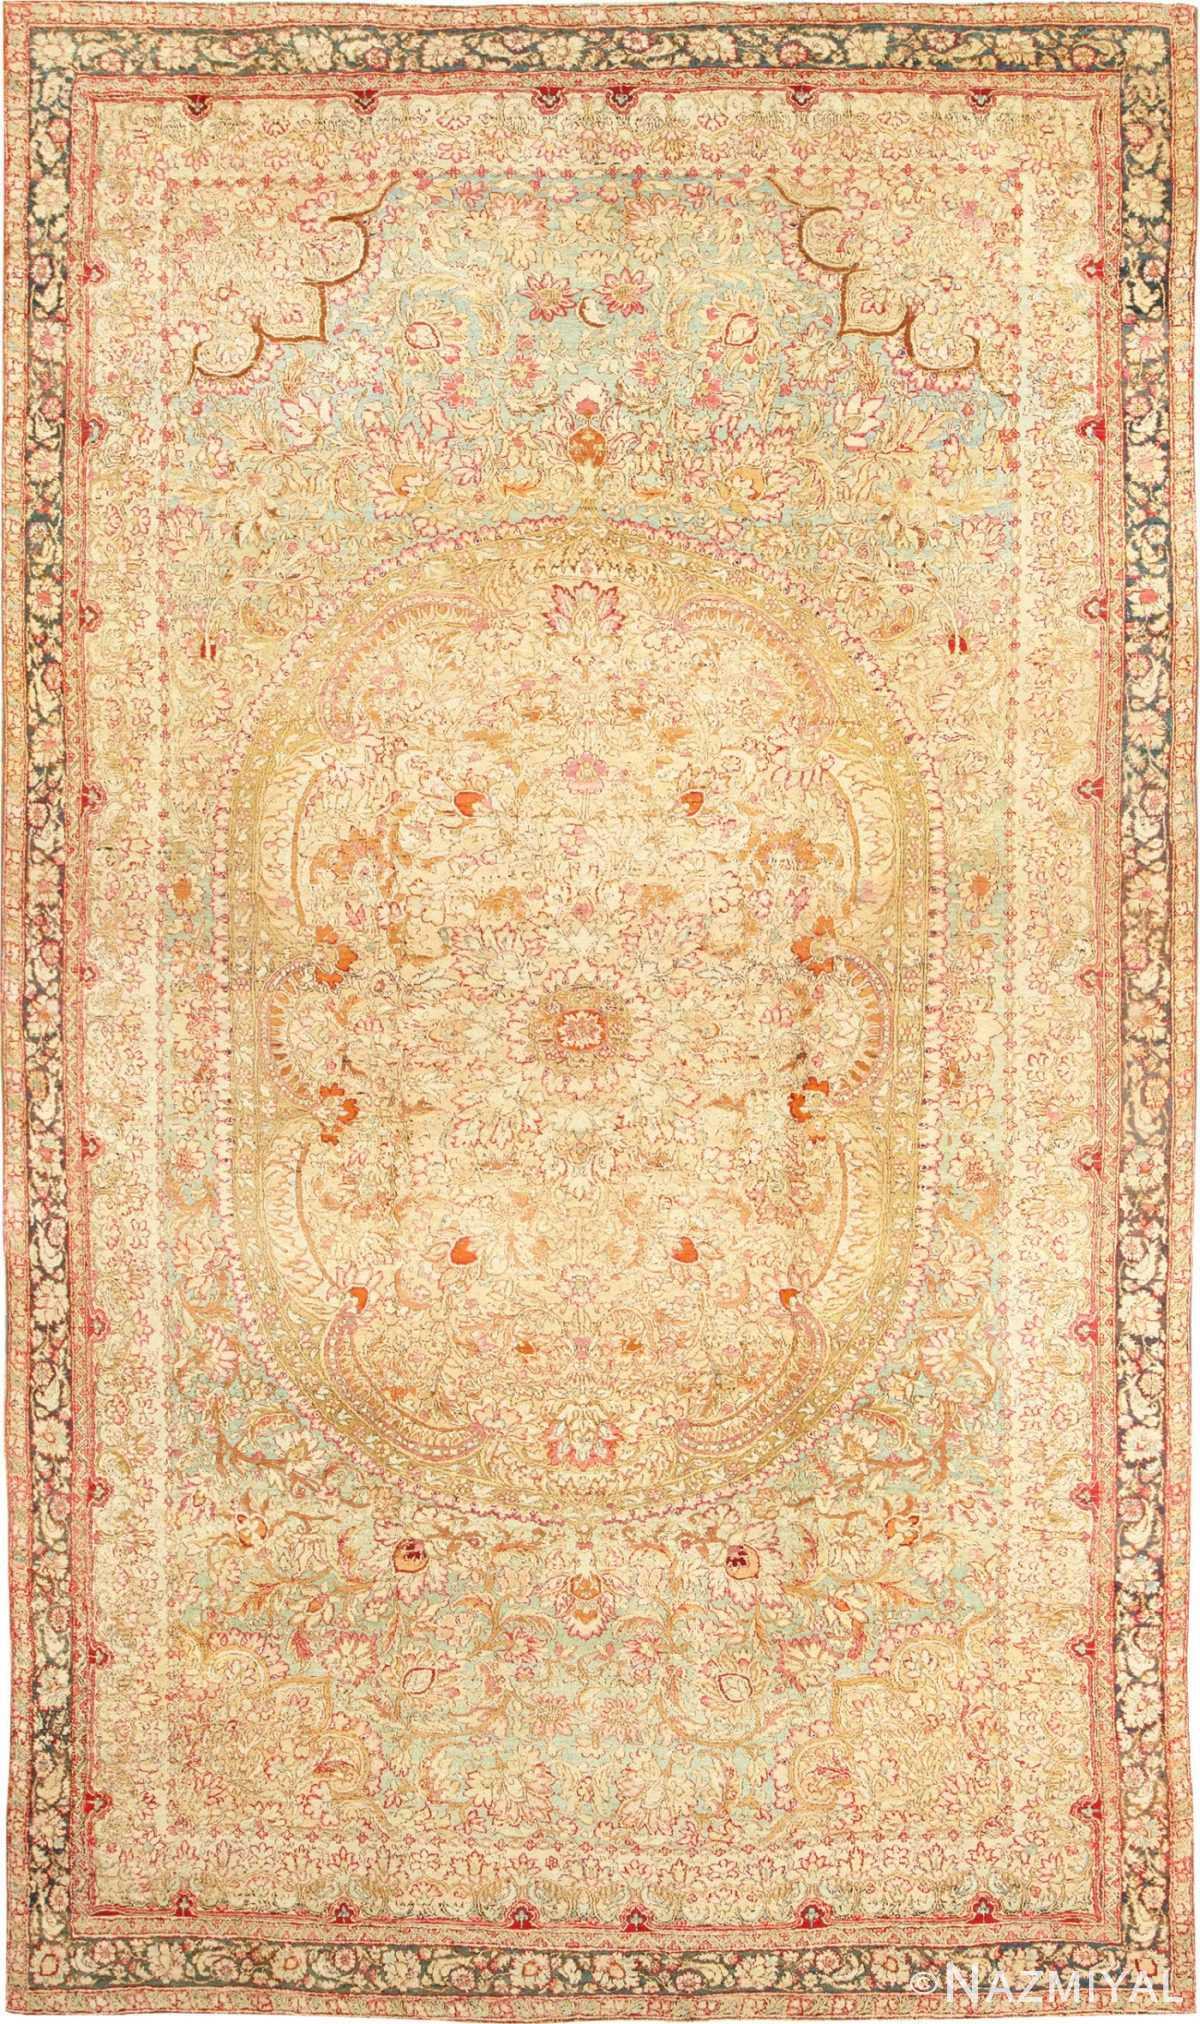 Rare and Breathtaking Large Antique Indian Agra Rug 48942 Nazmiyal